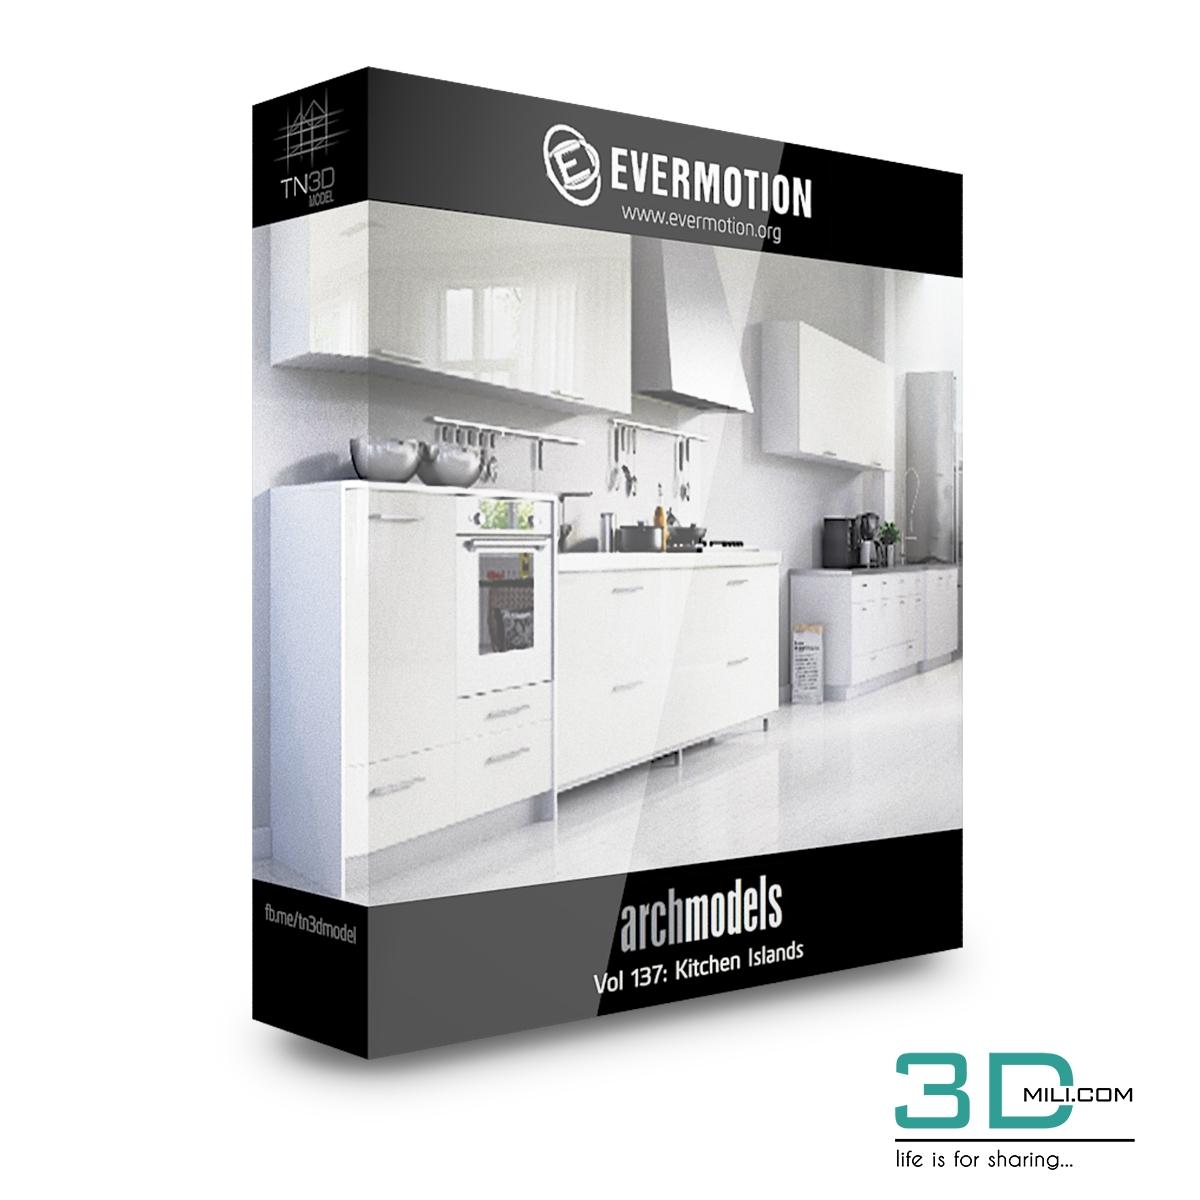 Evermotion Archmodels Vol 137: Kitchen Islands - 3D Mili - Download